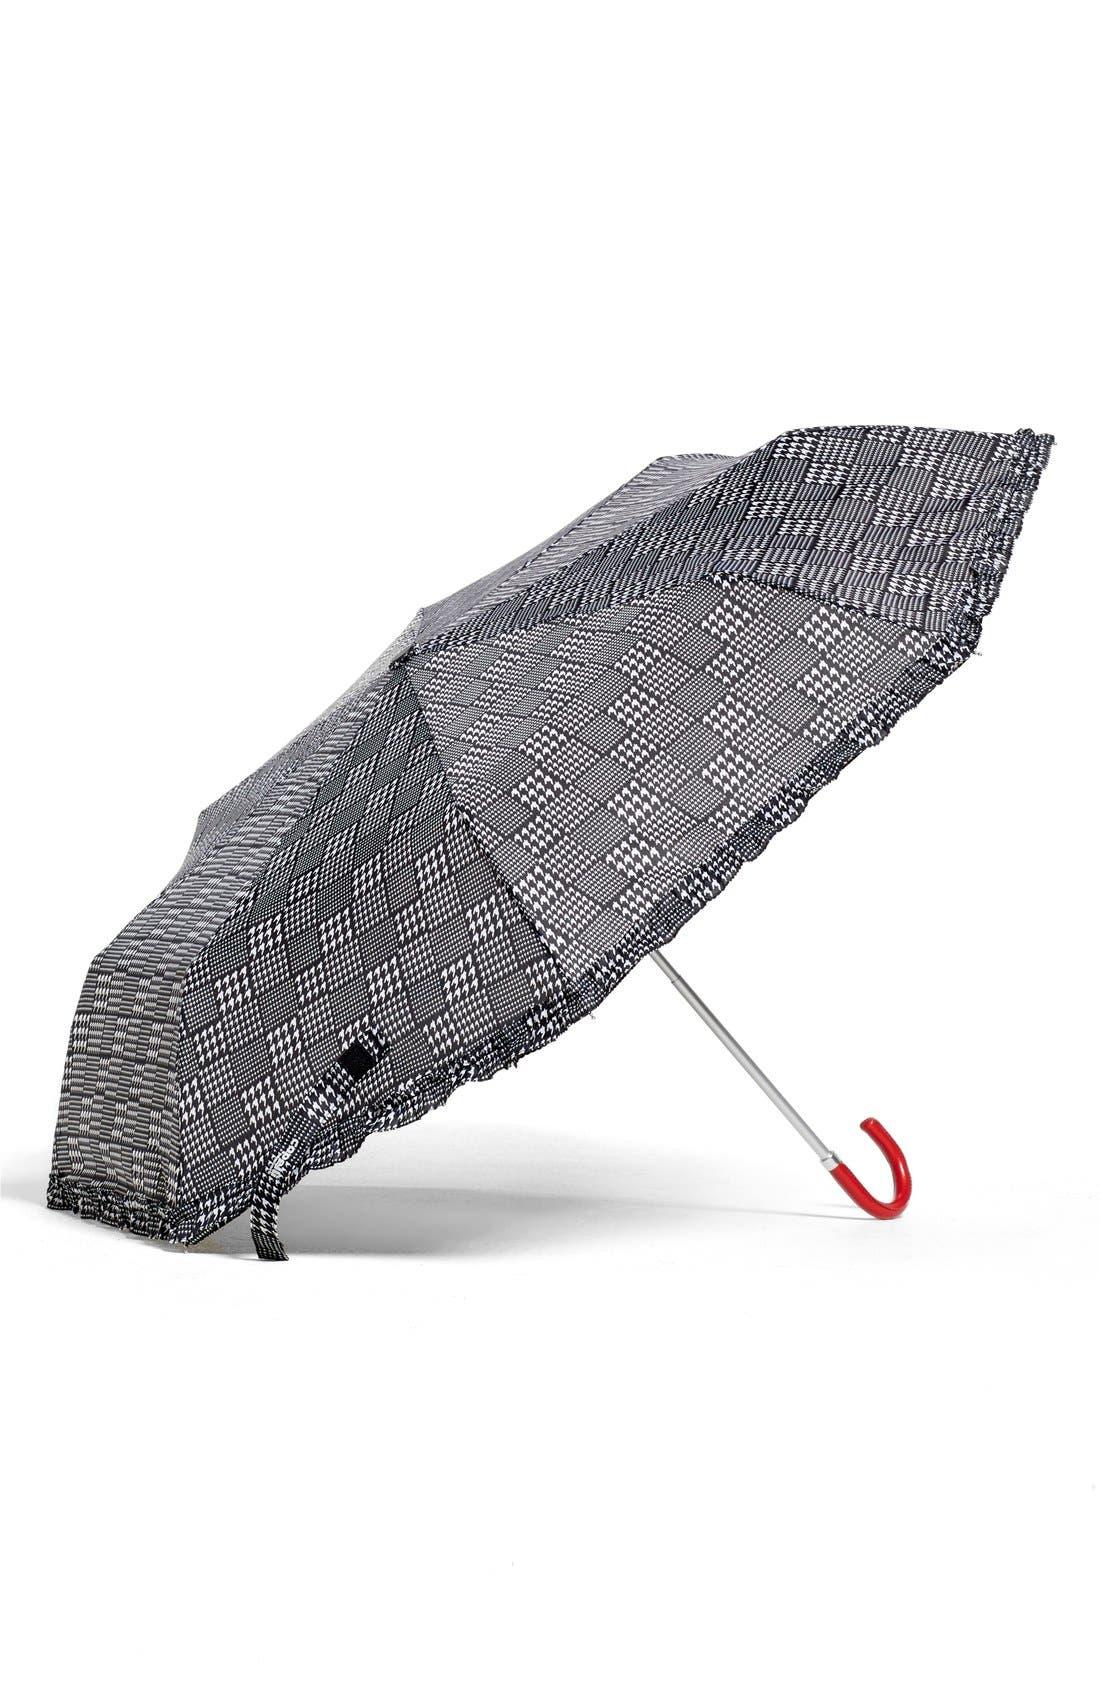 Capelli of New York Plaid Umbrella,                             Main thumbnail 1, color,                             White Combo